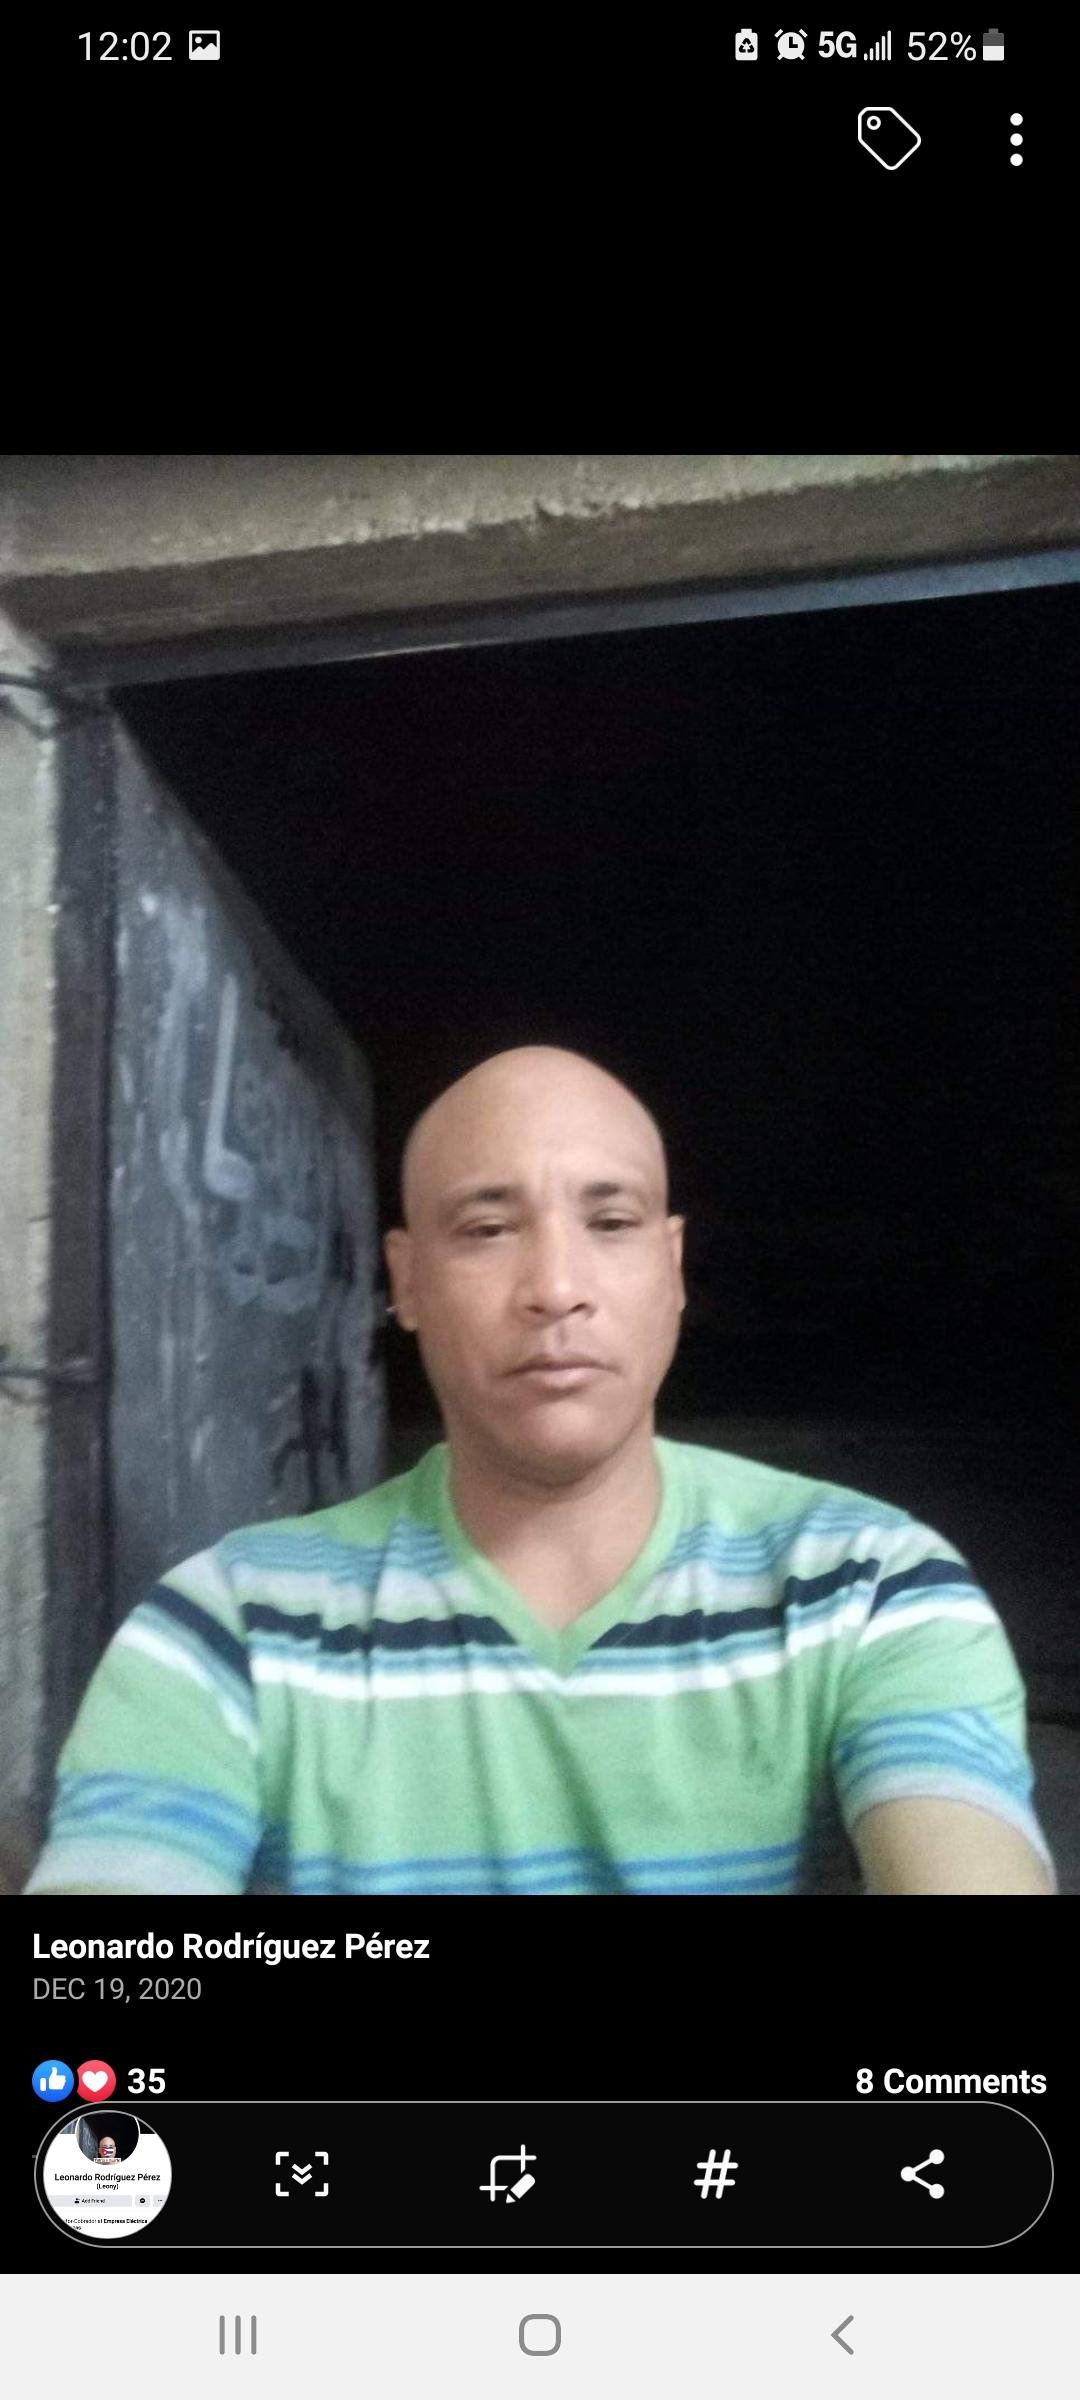 Leonardo Rodriguez Perez